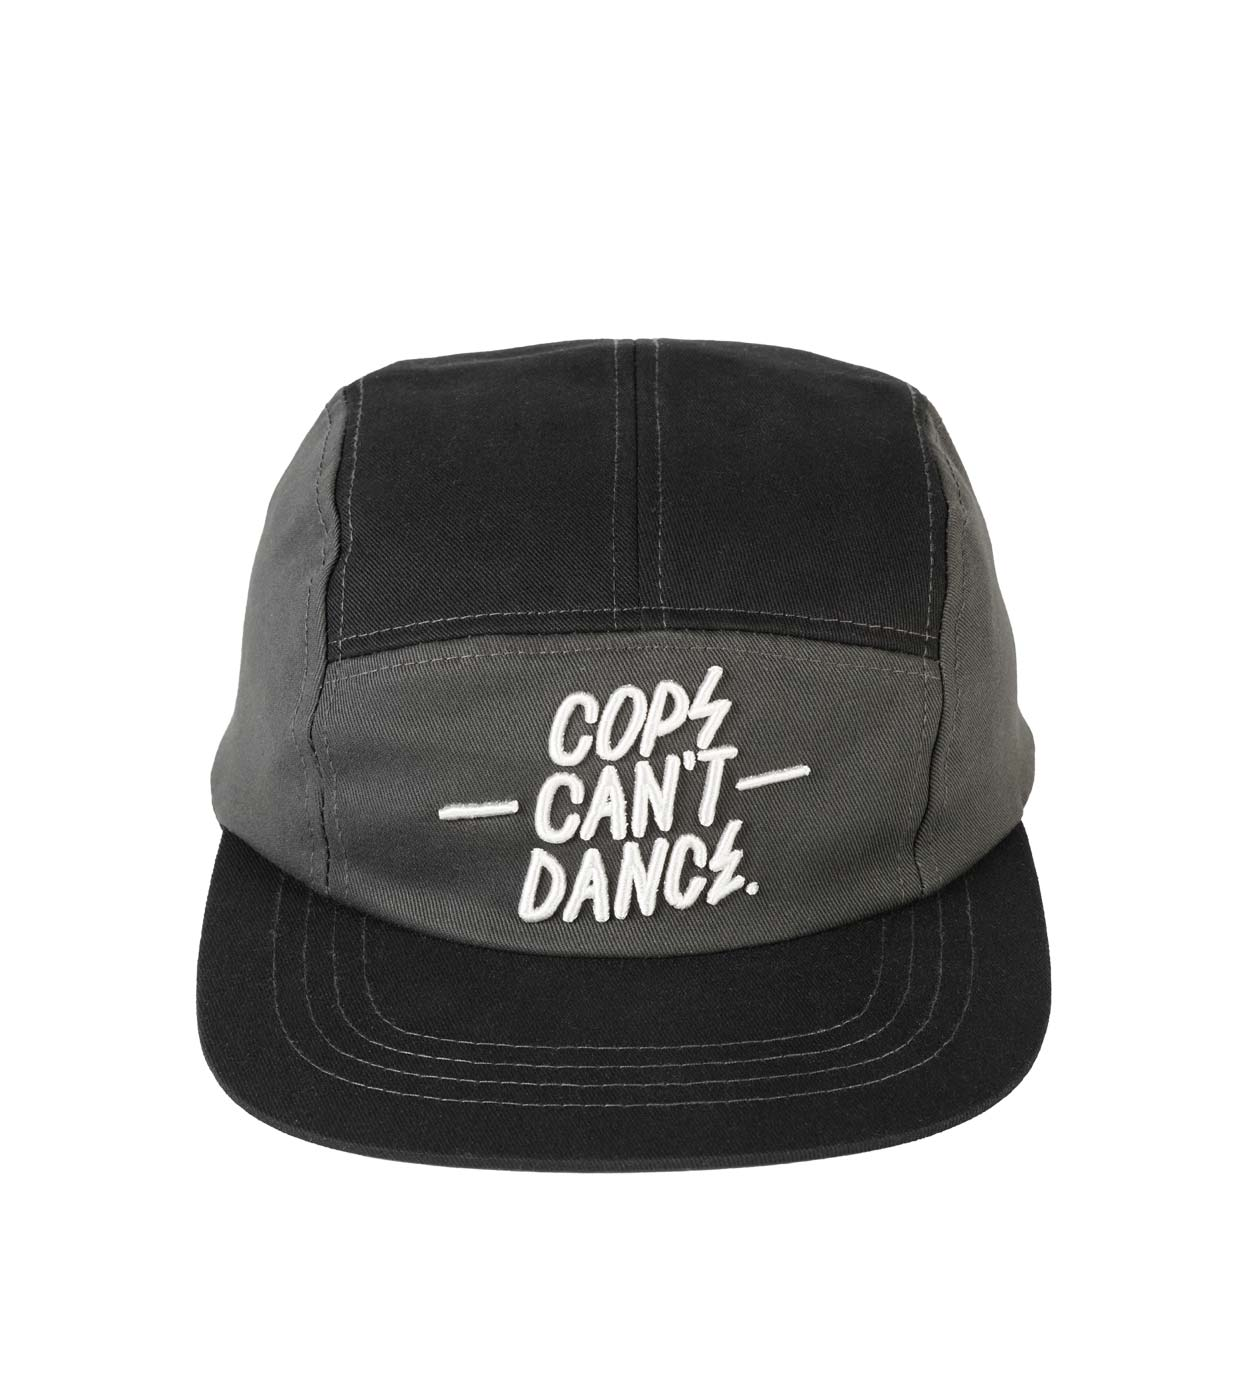 Mr Serious Cops can t dance cap black  grey - 5 panel snapback cap ... ae532b08a16